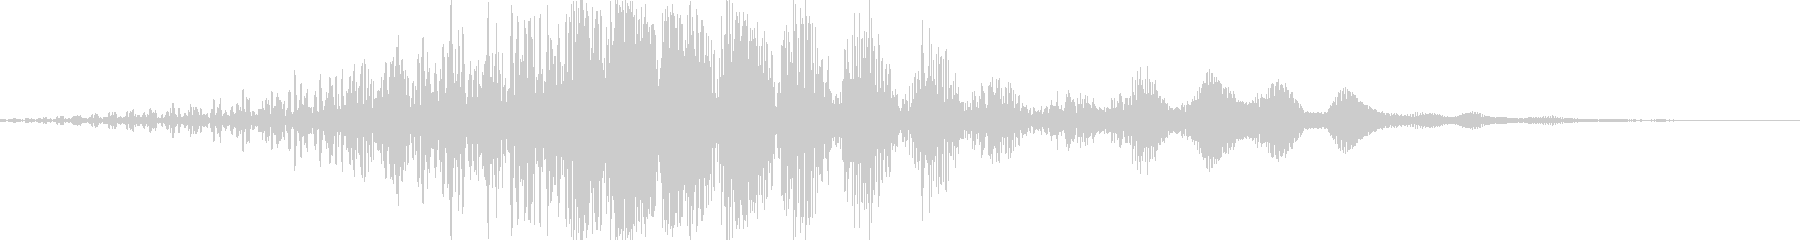 CINEMATIC WHOOSH 06の未再生の波形